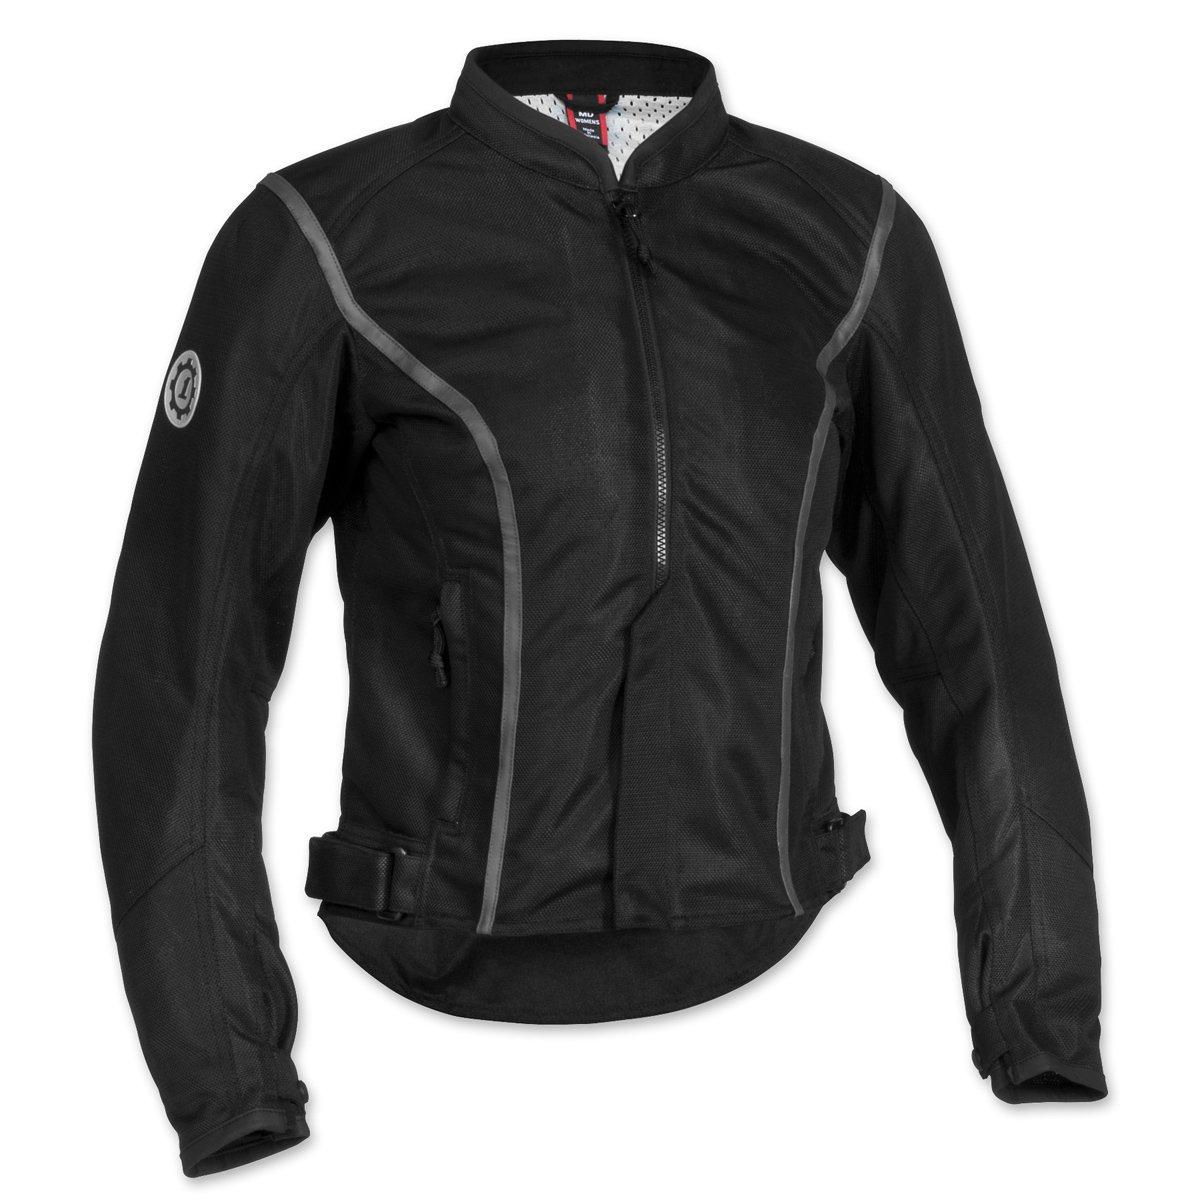 Firstgear Women's Contour Mesh Black Jacket, L